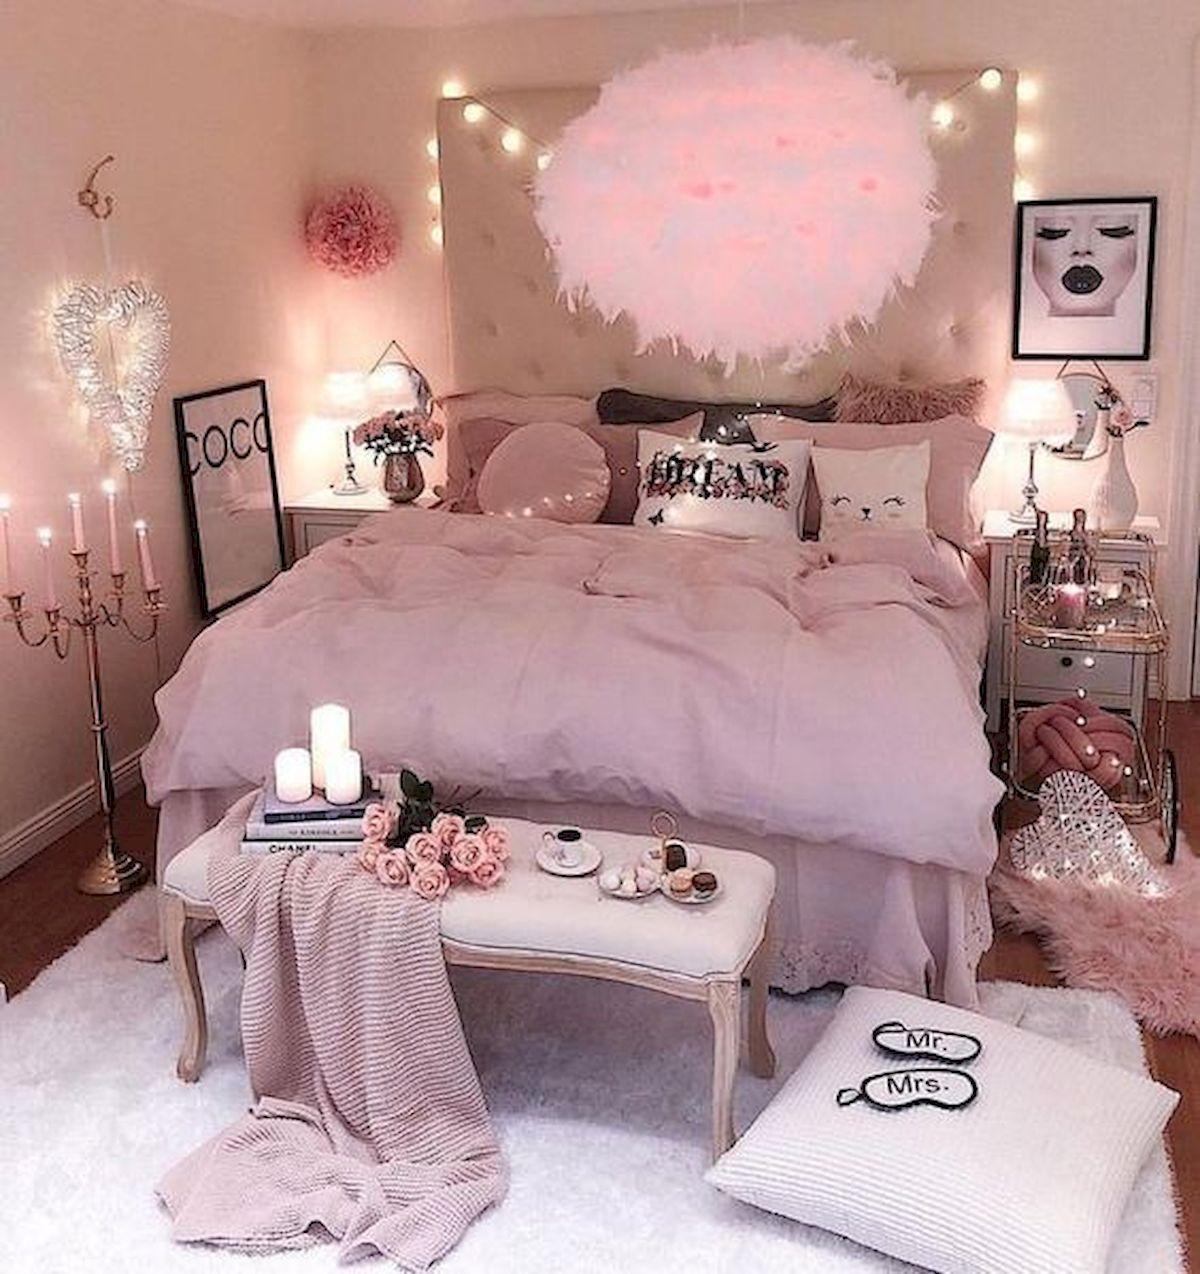 45 Beautiful Bedroom Decor Ideas for Teens (33)